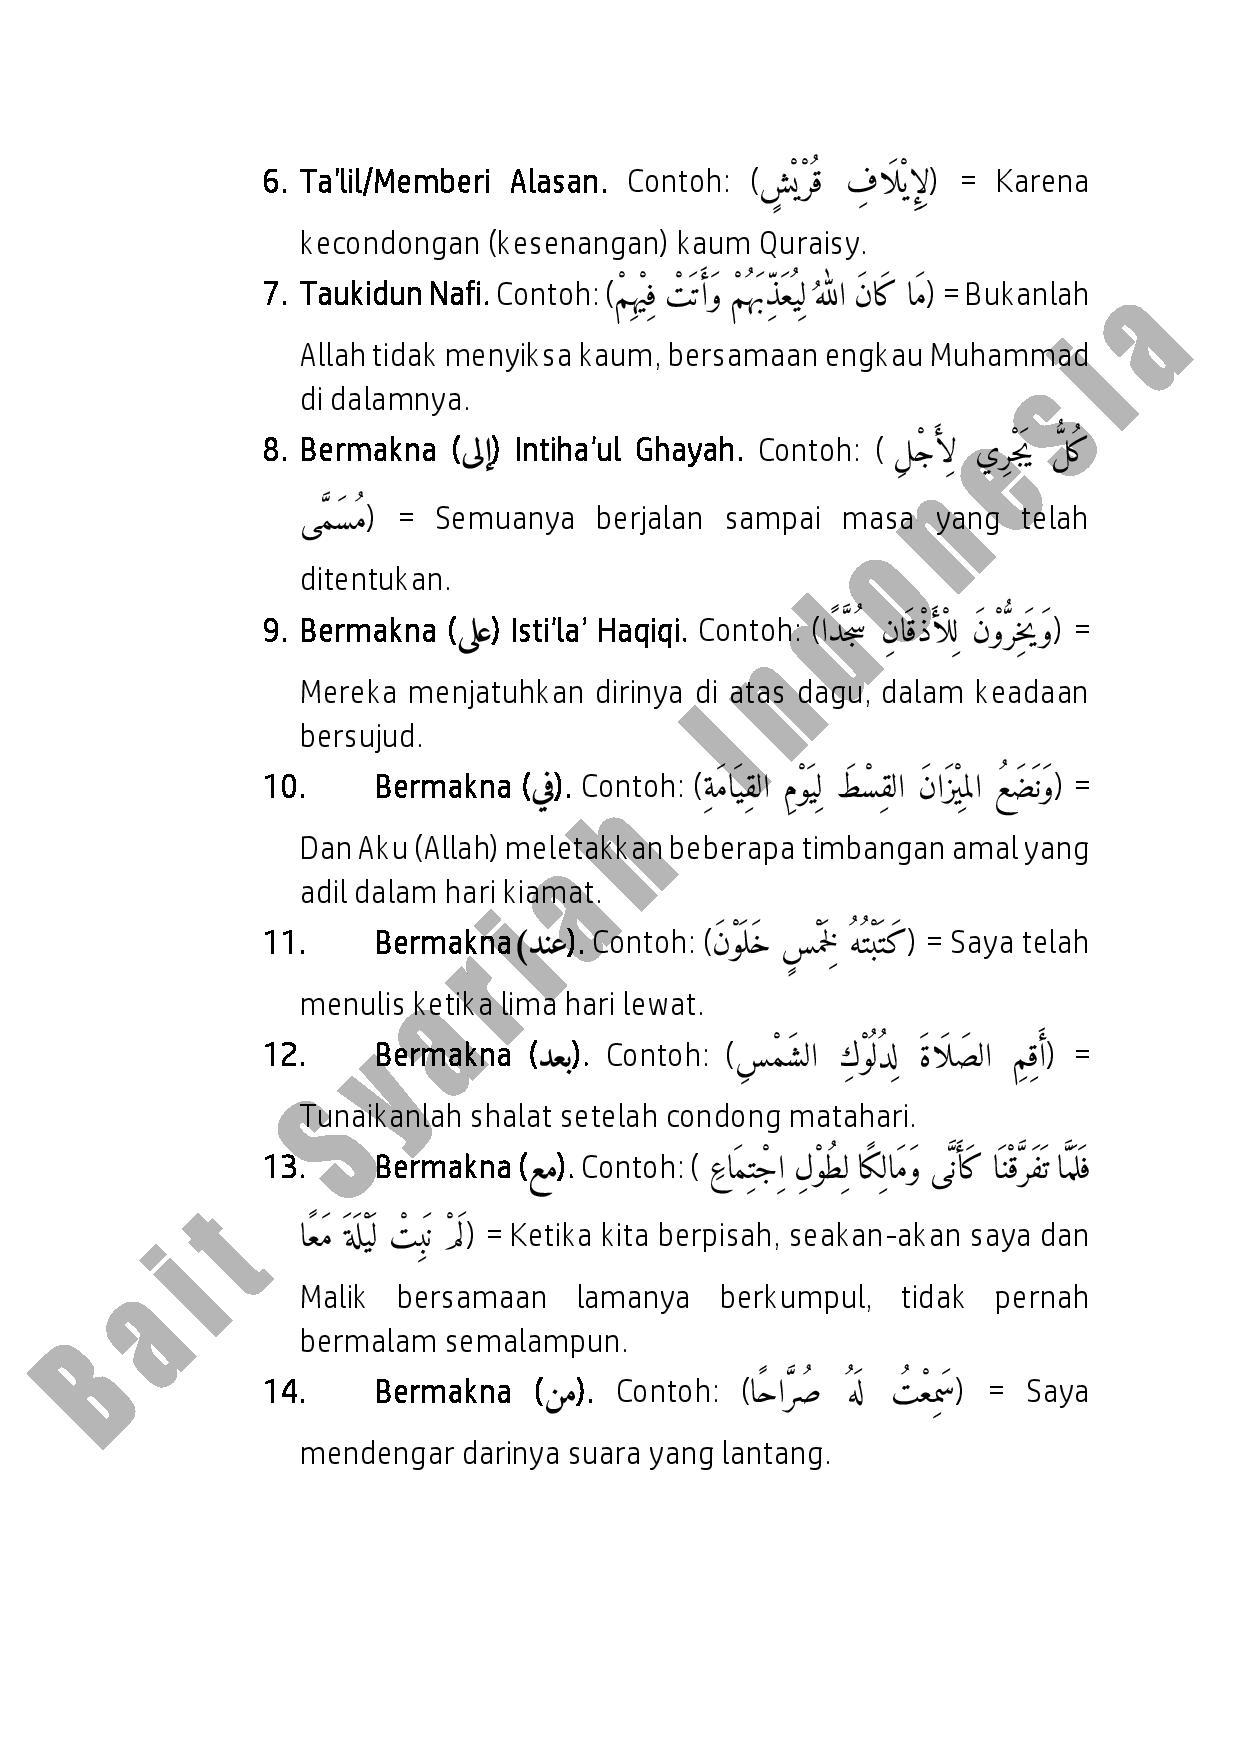 Contoh Huruf Jar : contoh, huruf, Nahwu, Huruf